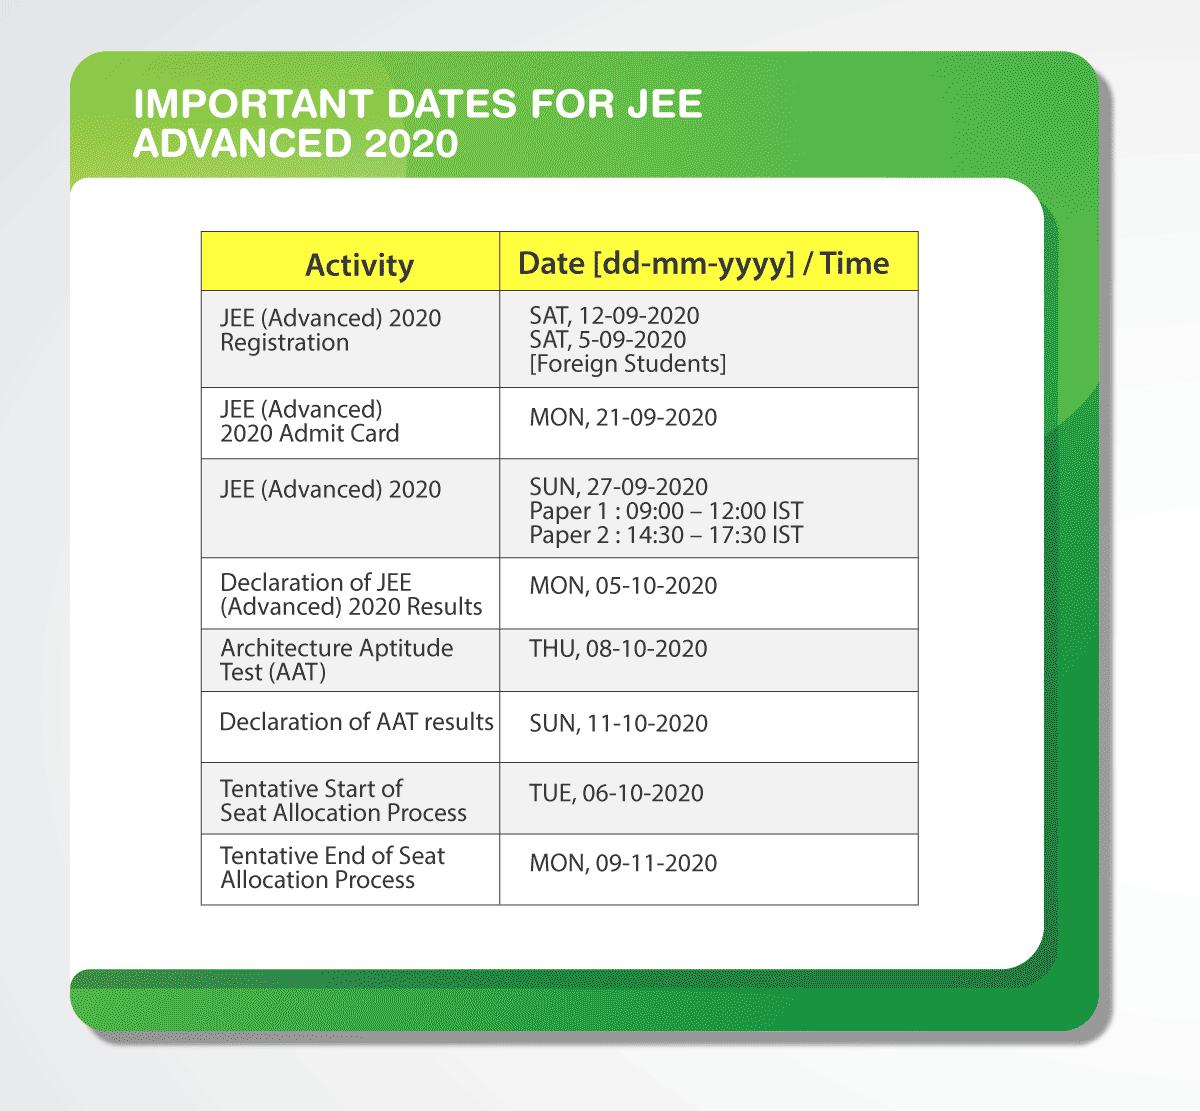 JEE Advanced 2020 Important Dates